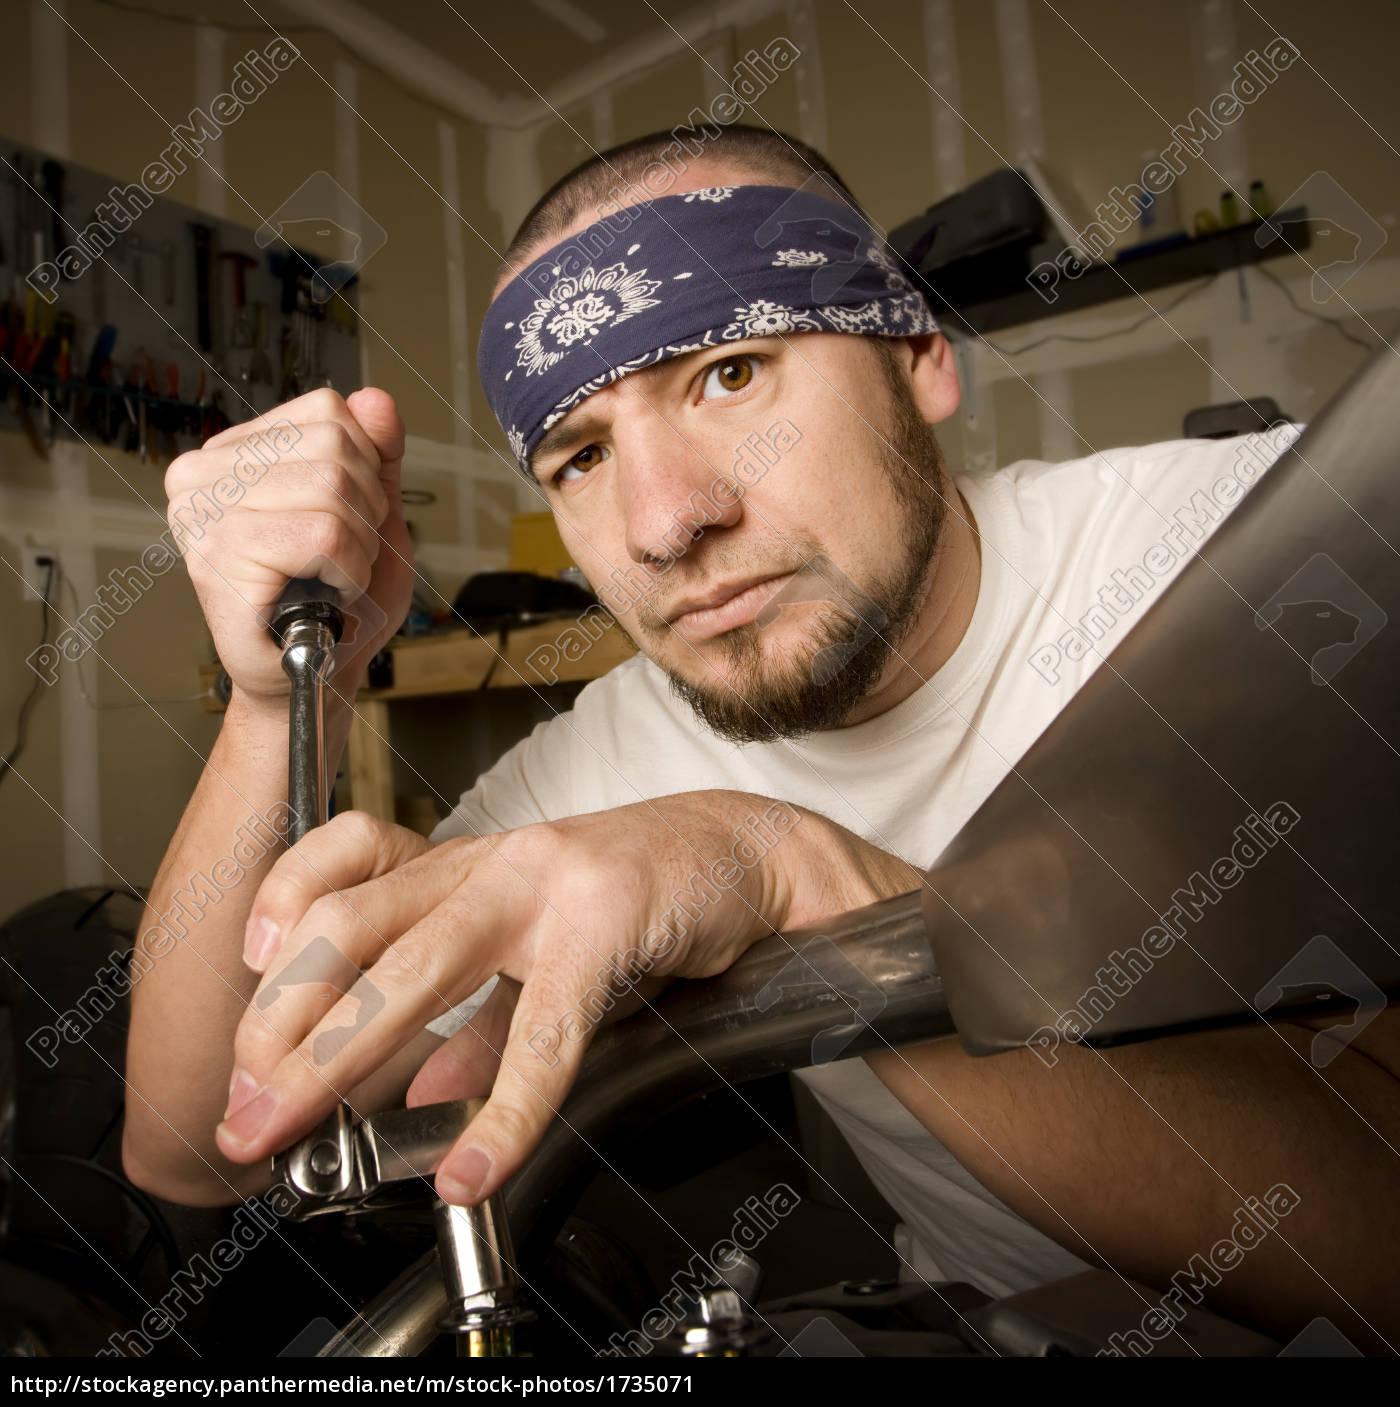 hispanic, mechanic - 1735071